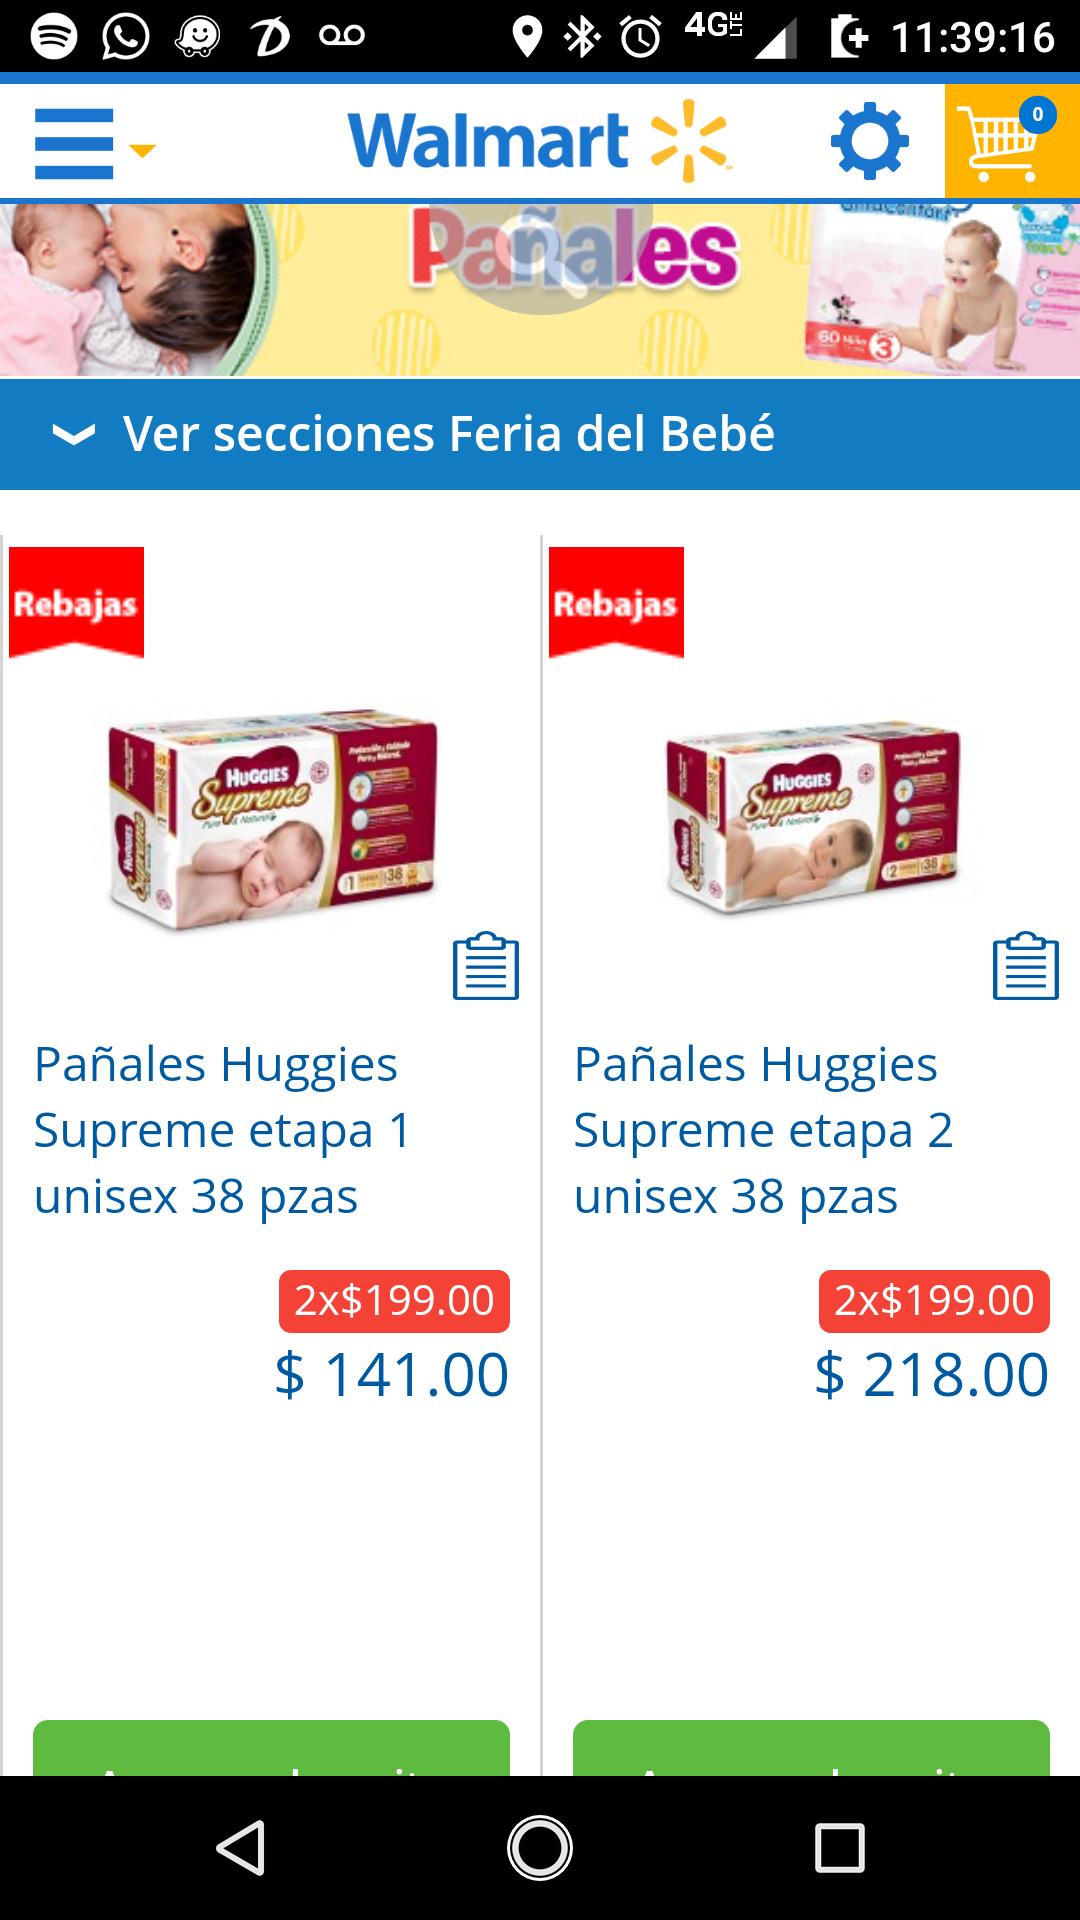 Walmart: online pañales Huggies supreme etapa RN, 1 y 2 a  2x$199